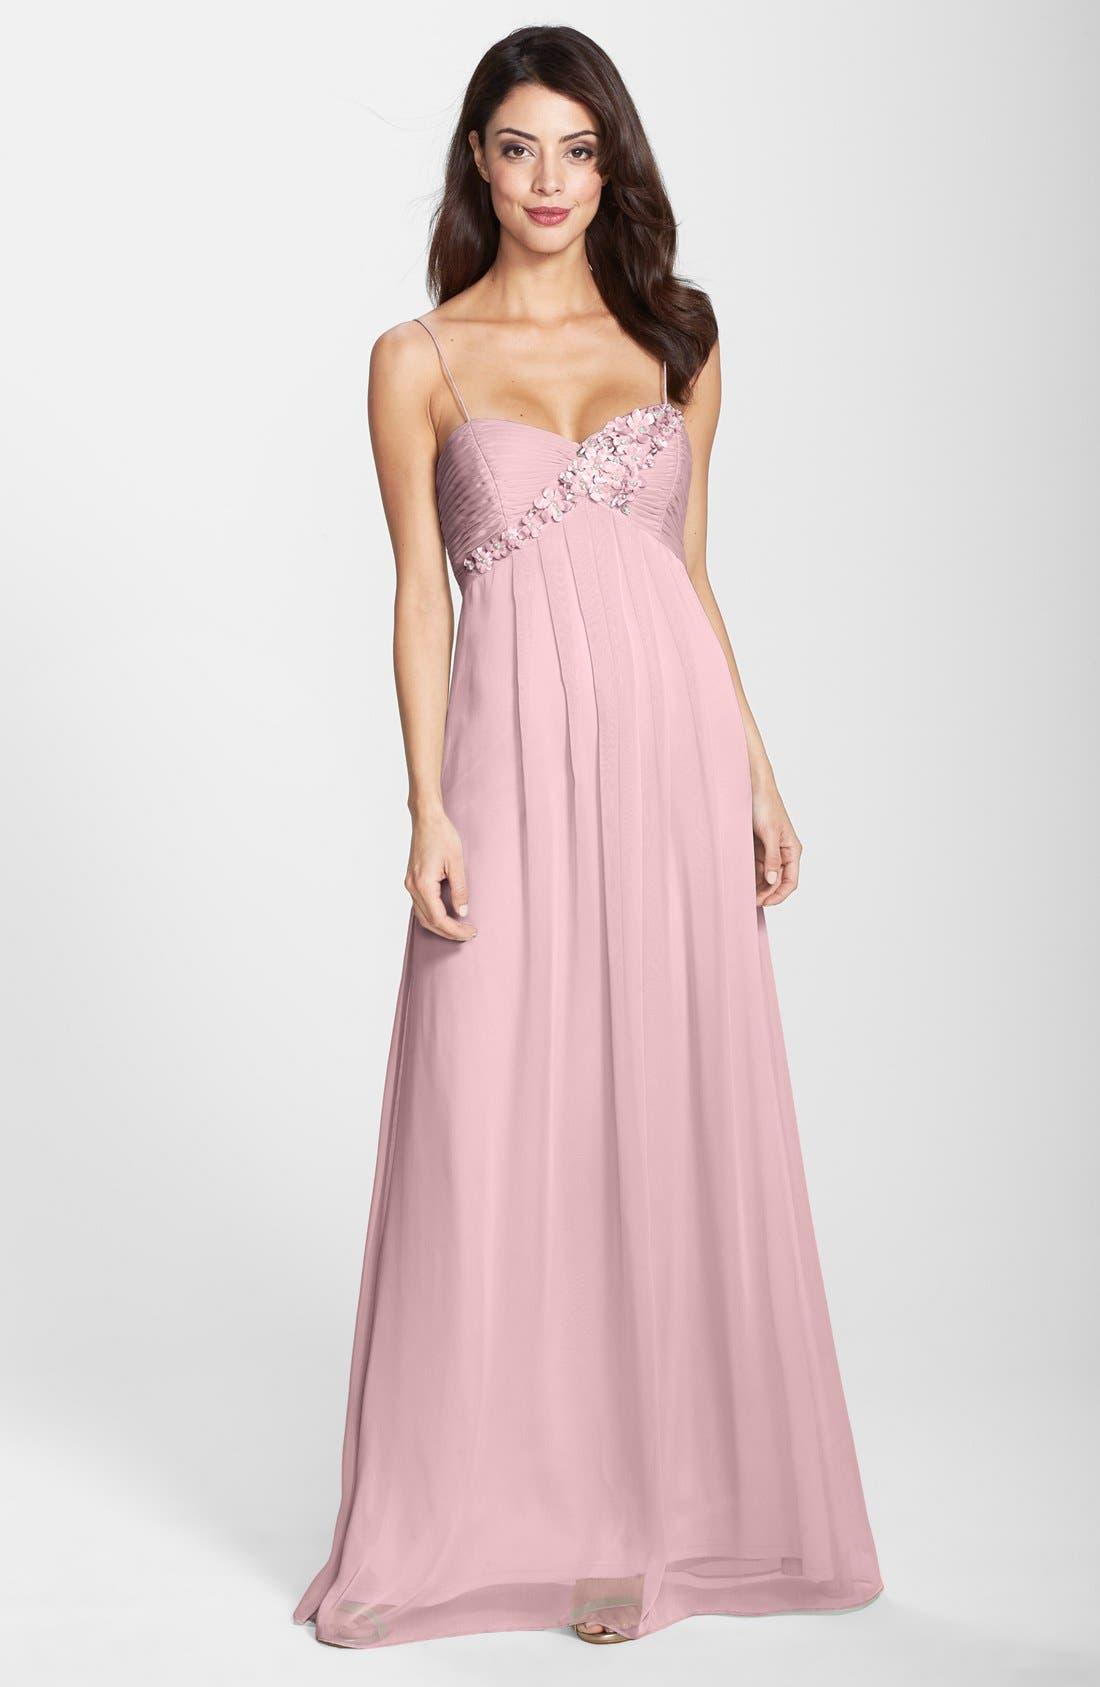 Main Image - Adrianna Papell Floral Appliqué Chiffon Dress